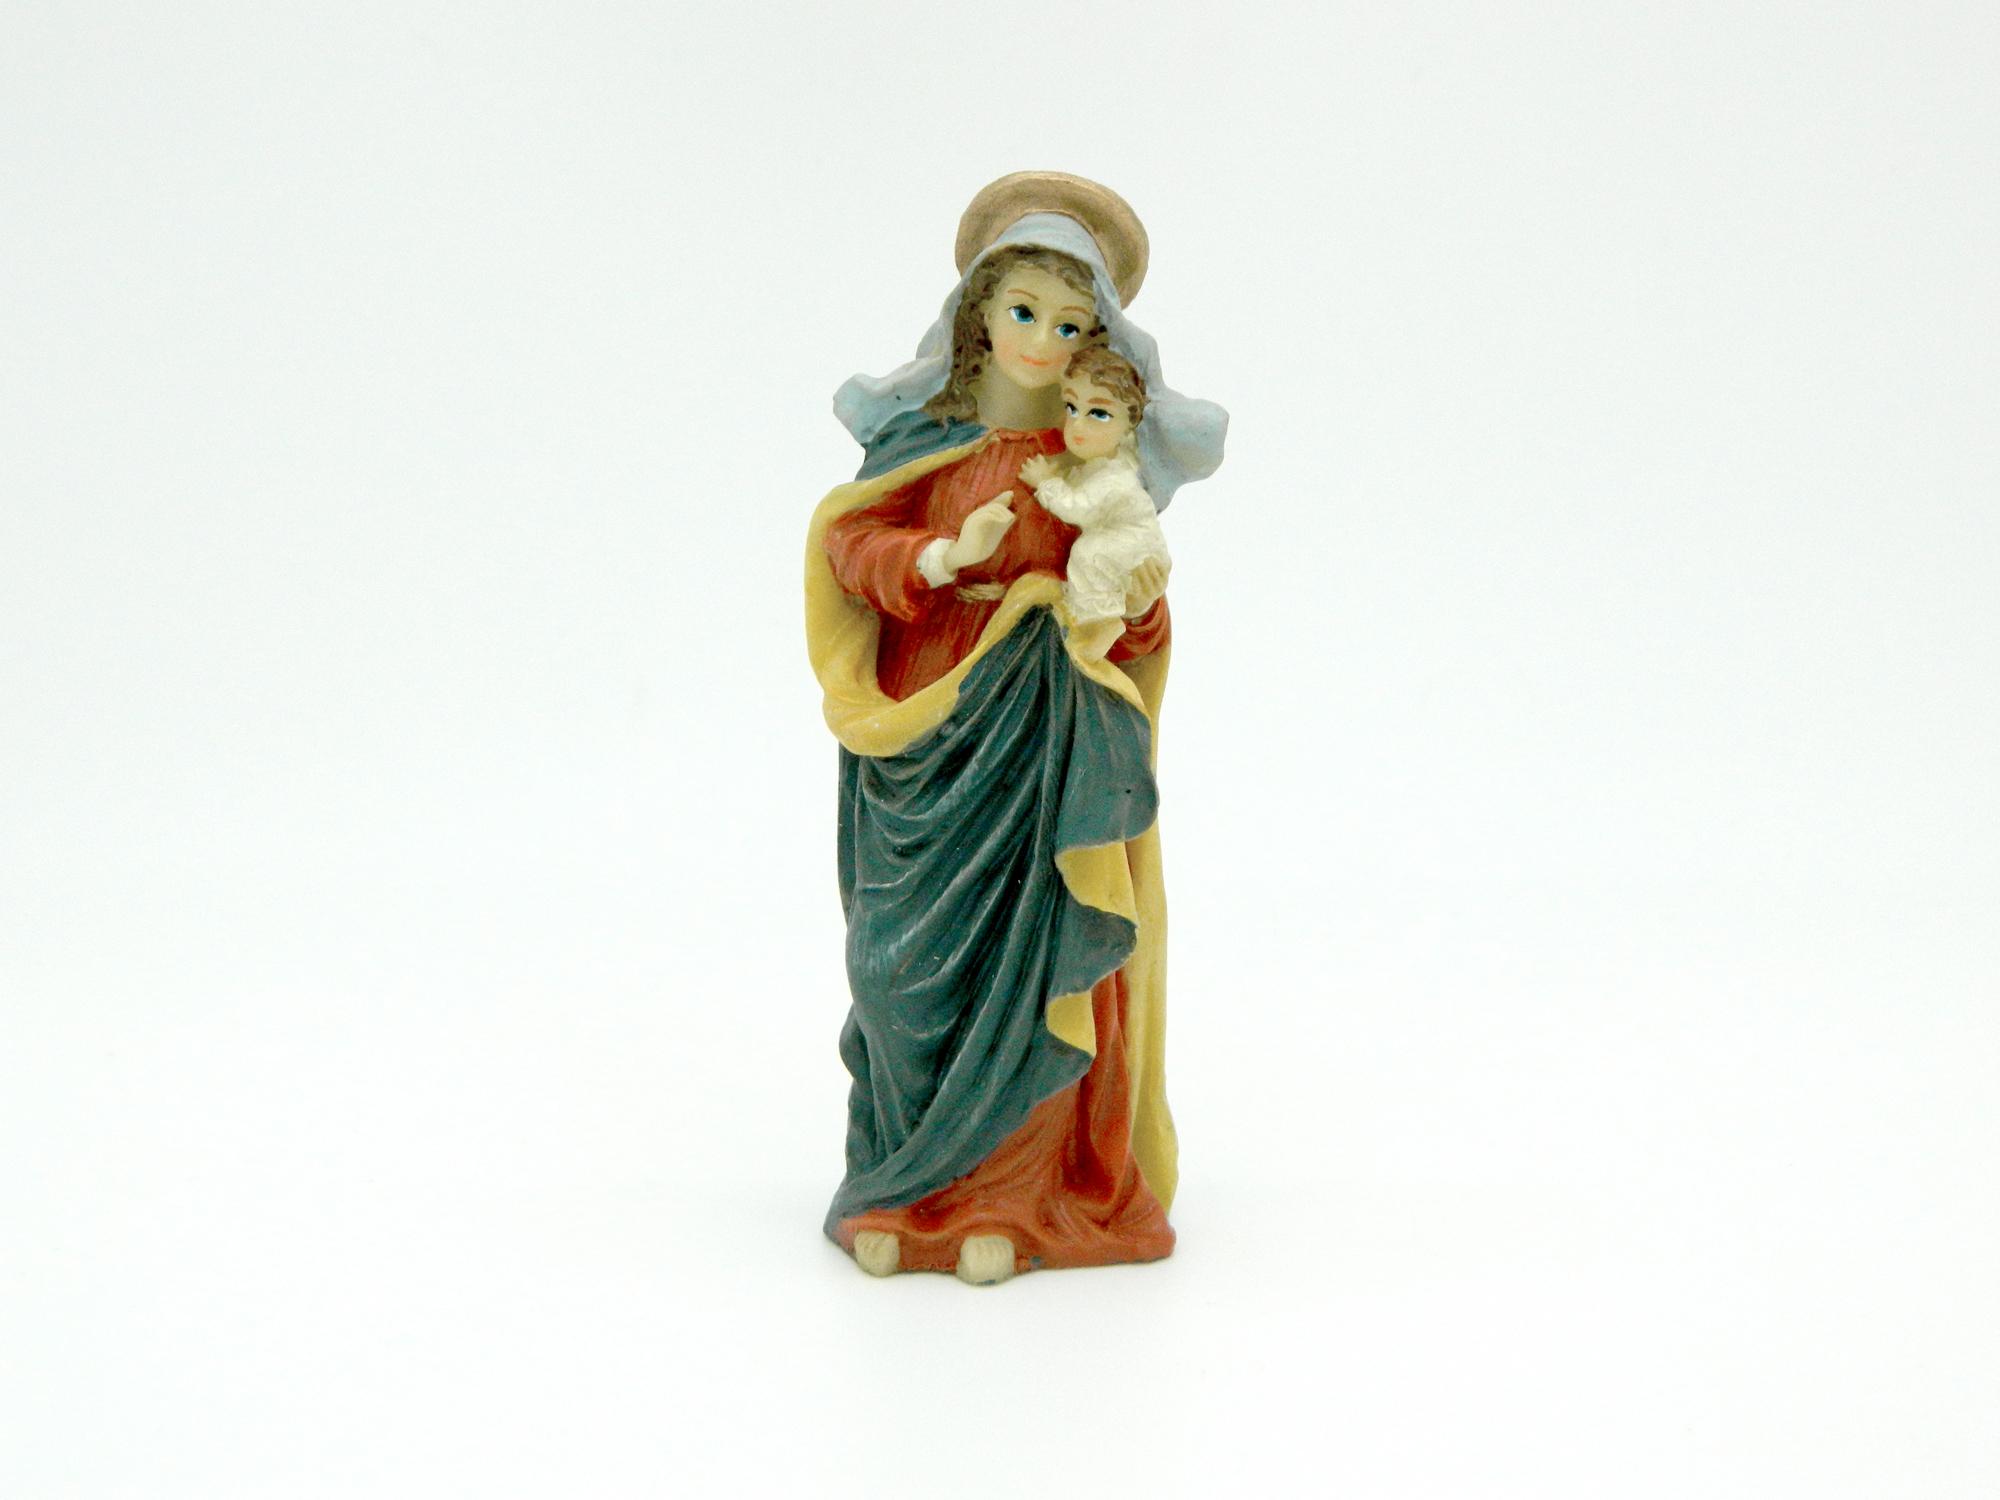 Mary figure photo